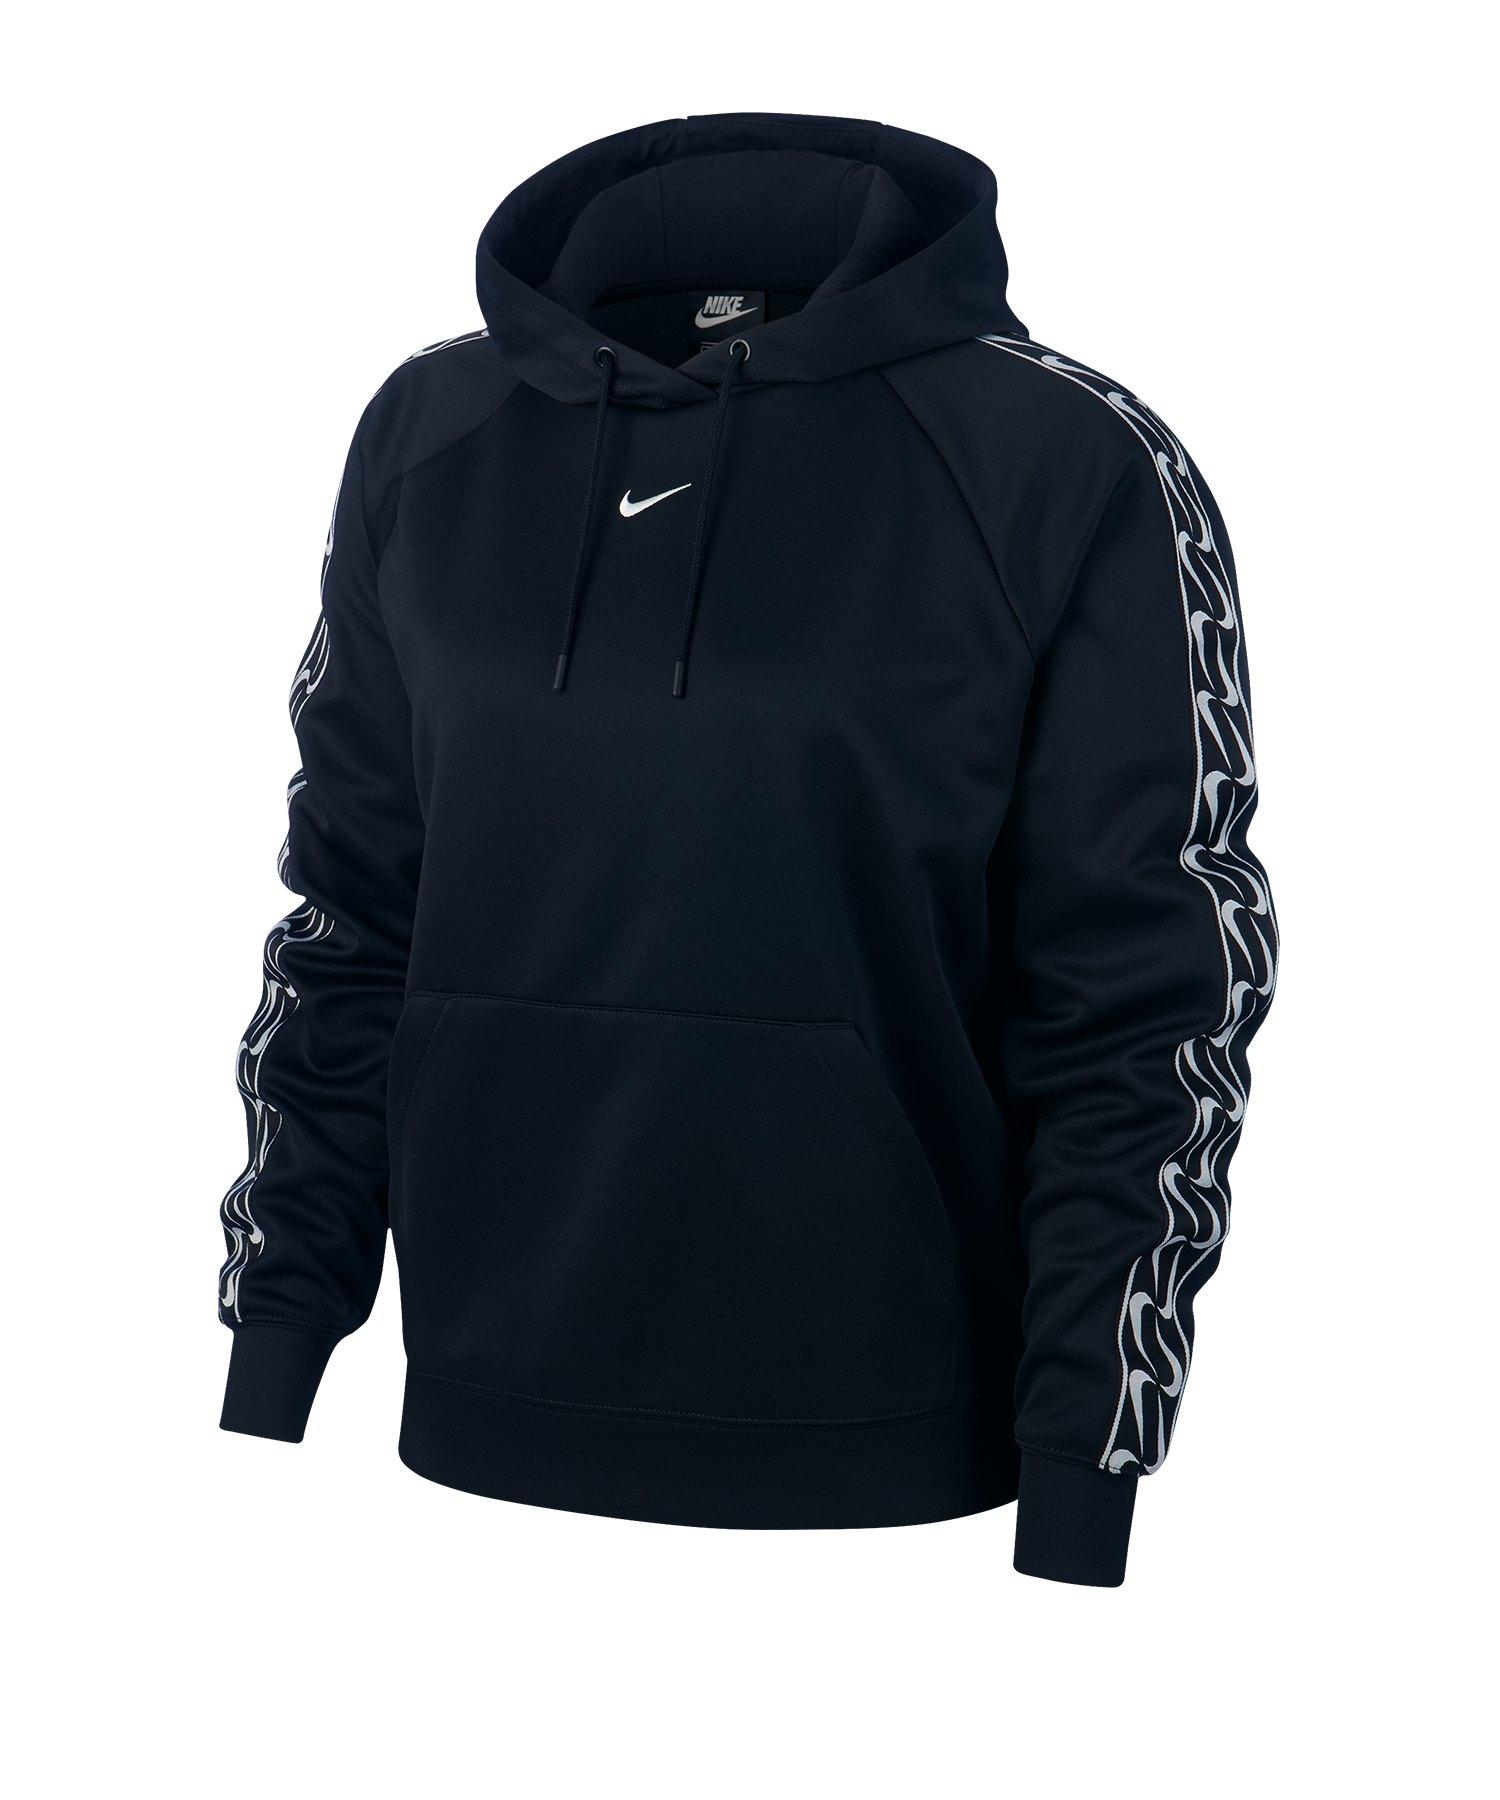 Nike Swoosh Hoody Kapuzenpullover Damen F010 - schwarz